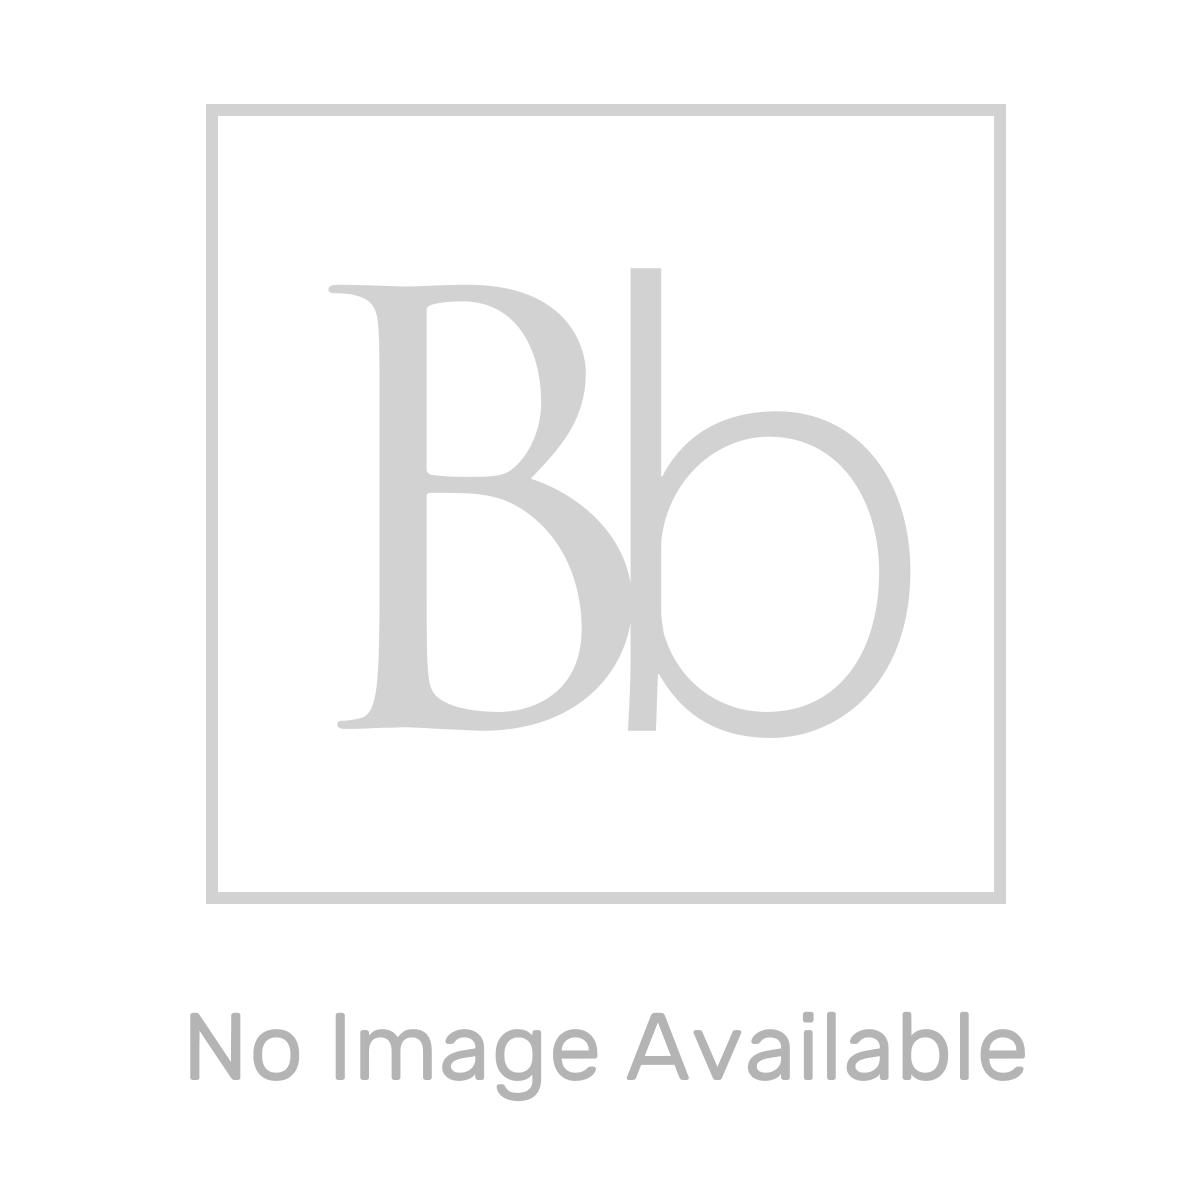 Aquadart White Slate Shower Tray 1500 x 700 Lifestyle